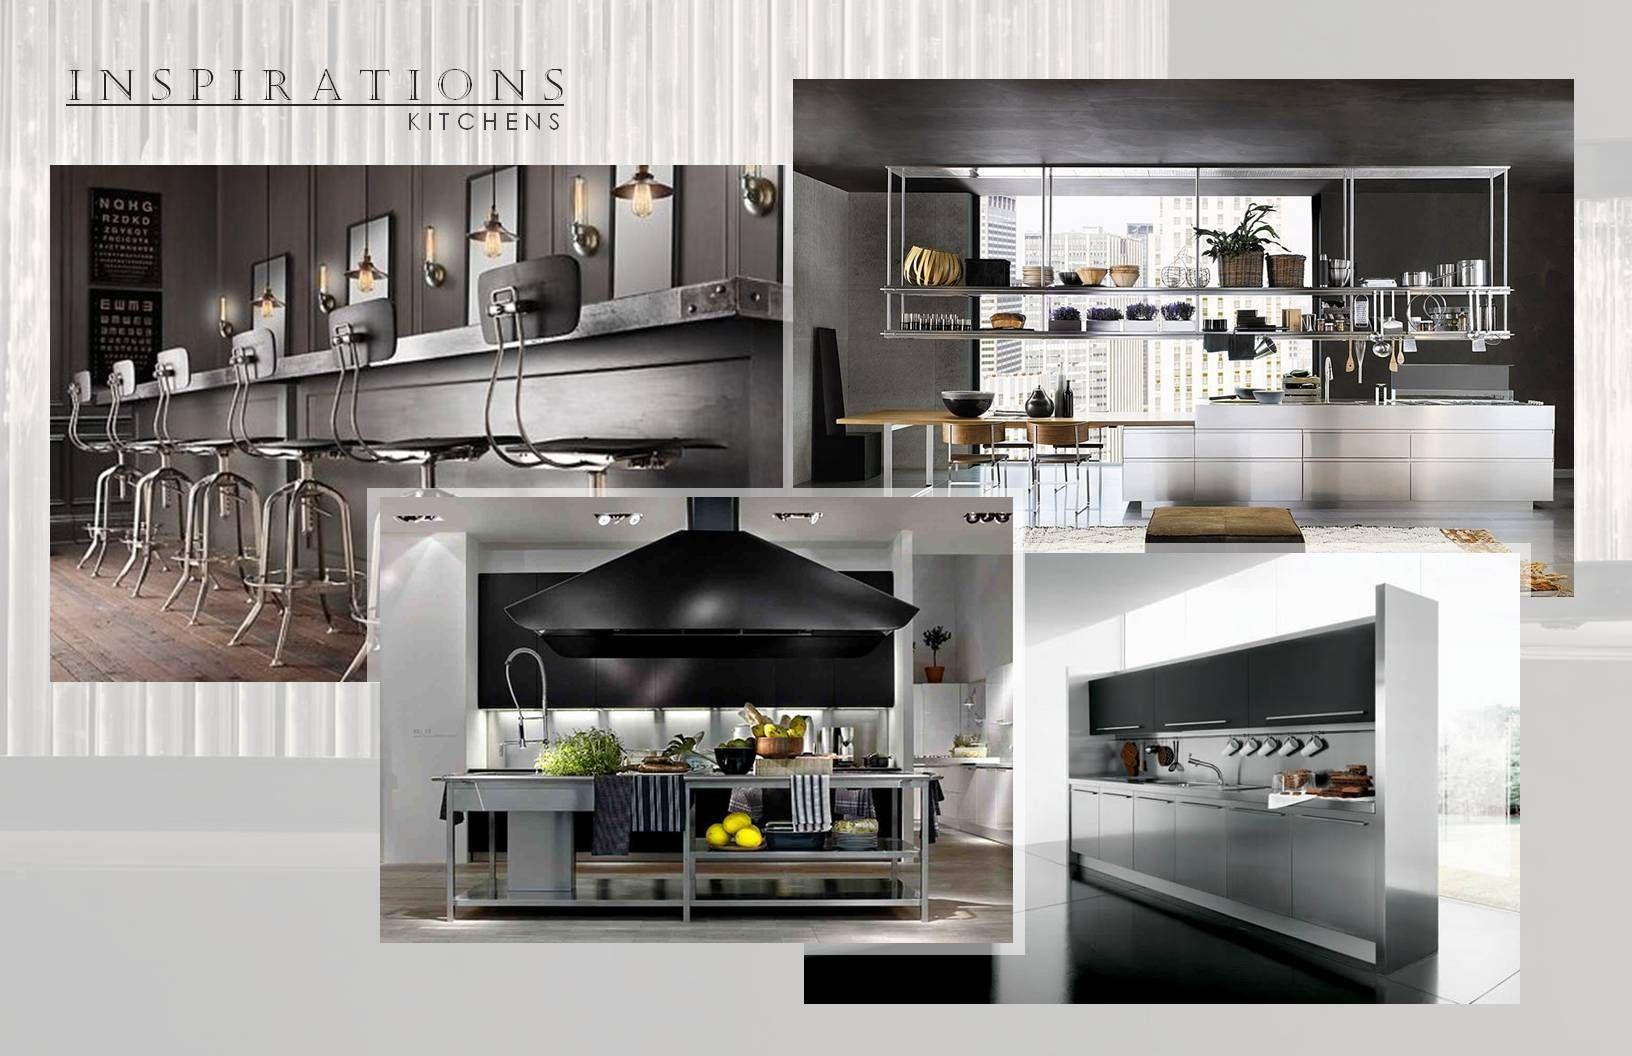 inspirational presentation rs3 designs interior design kitchen furniture accessori on kitchen interior accessories id=64823